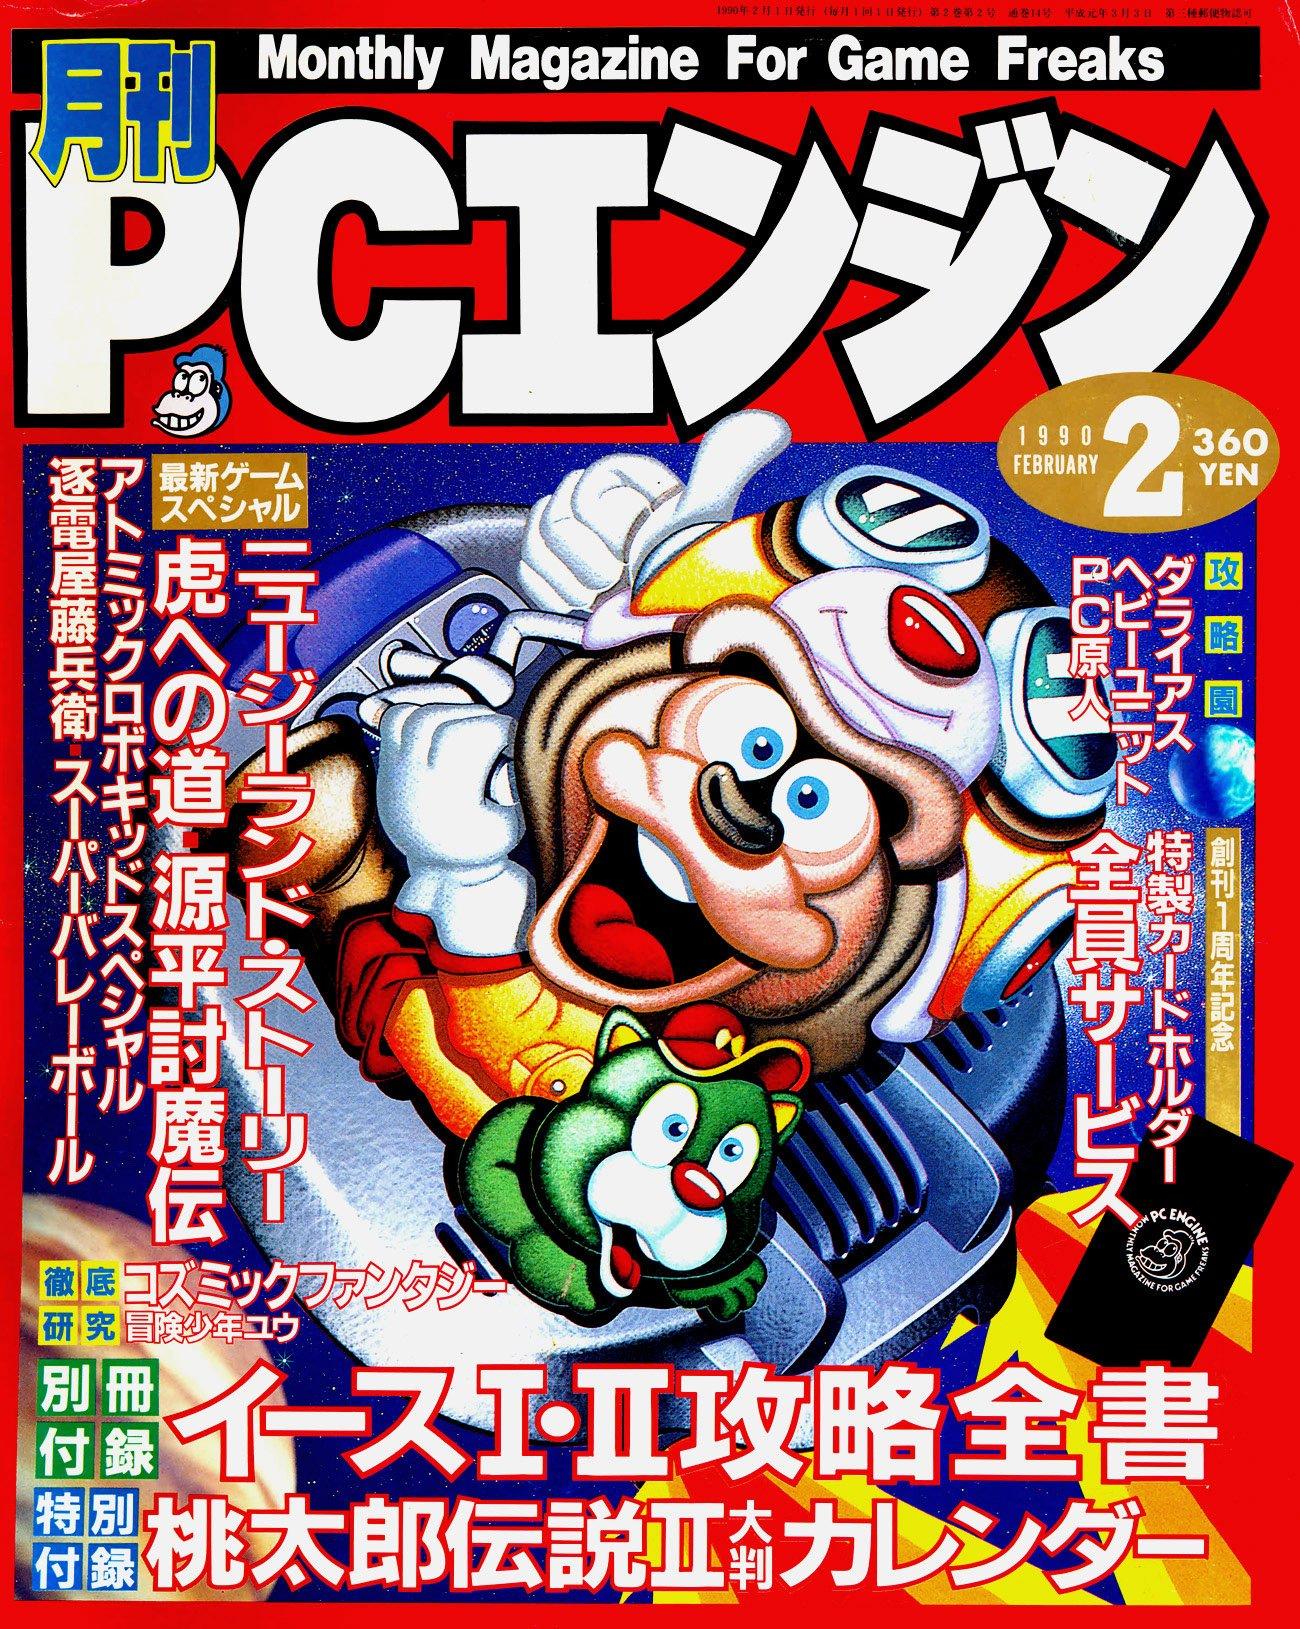 Gekkan PC Engine Issue 14 (February 1990)